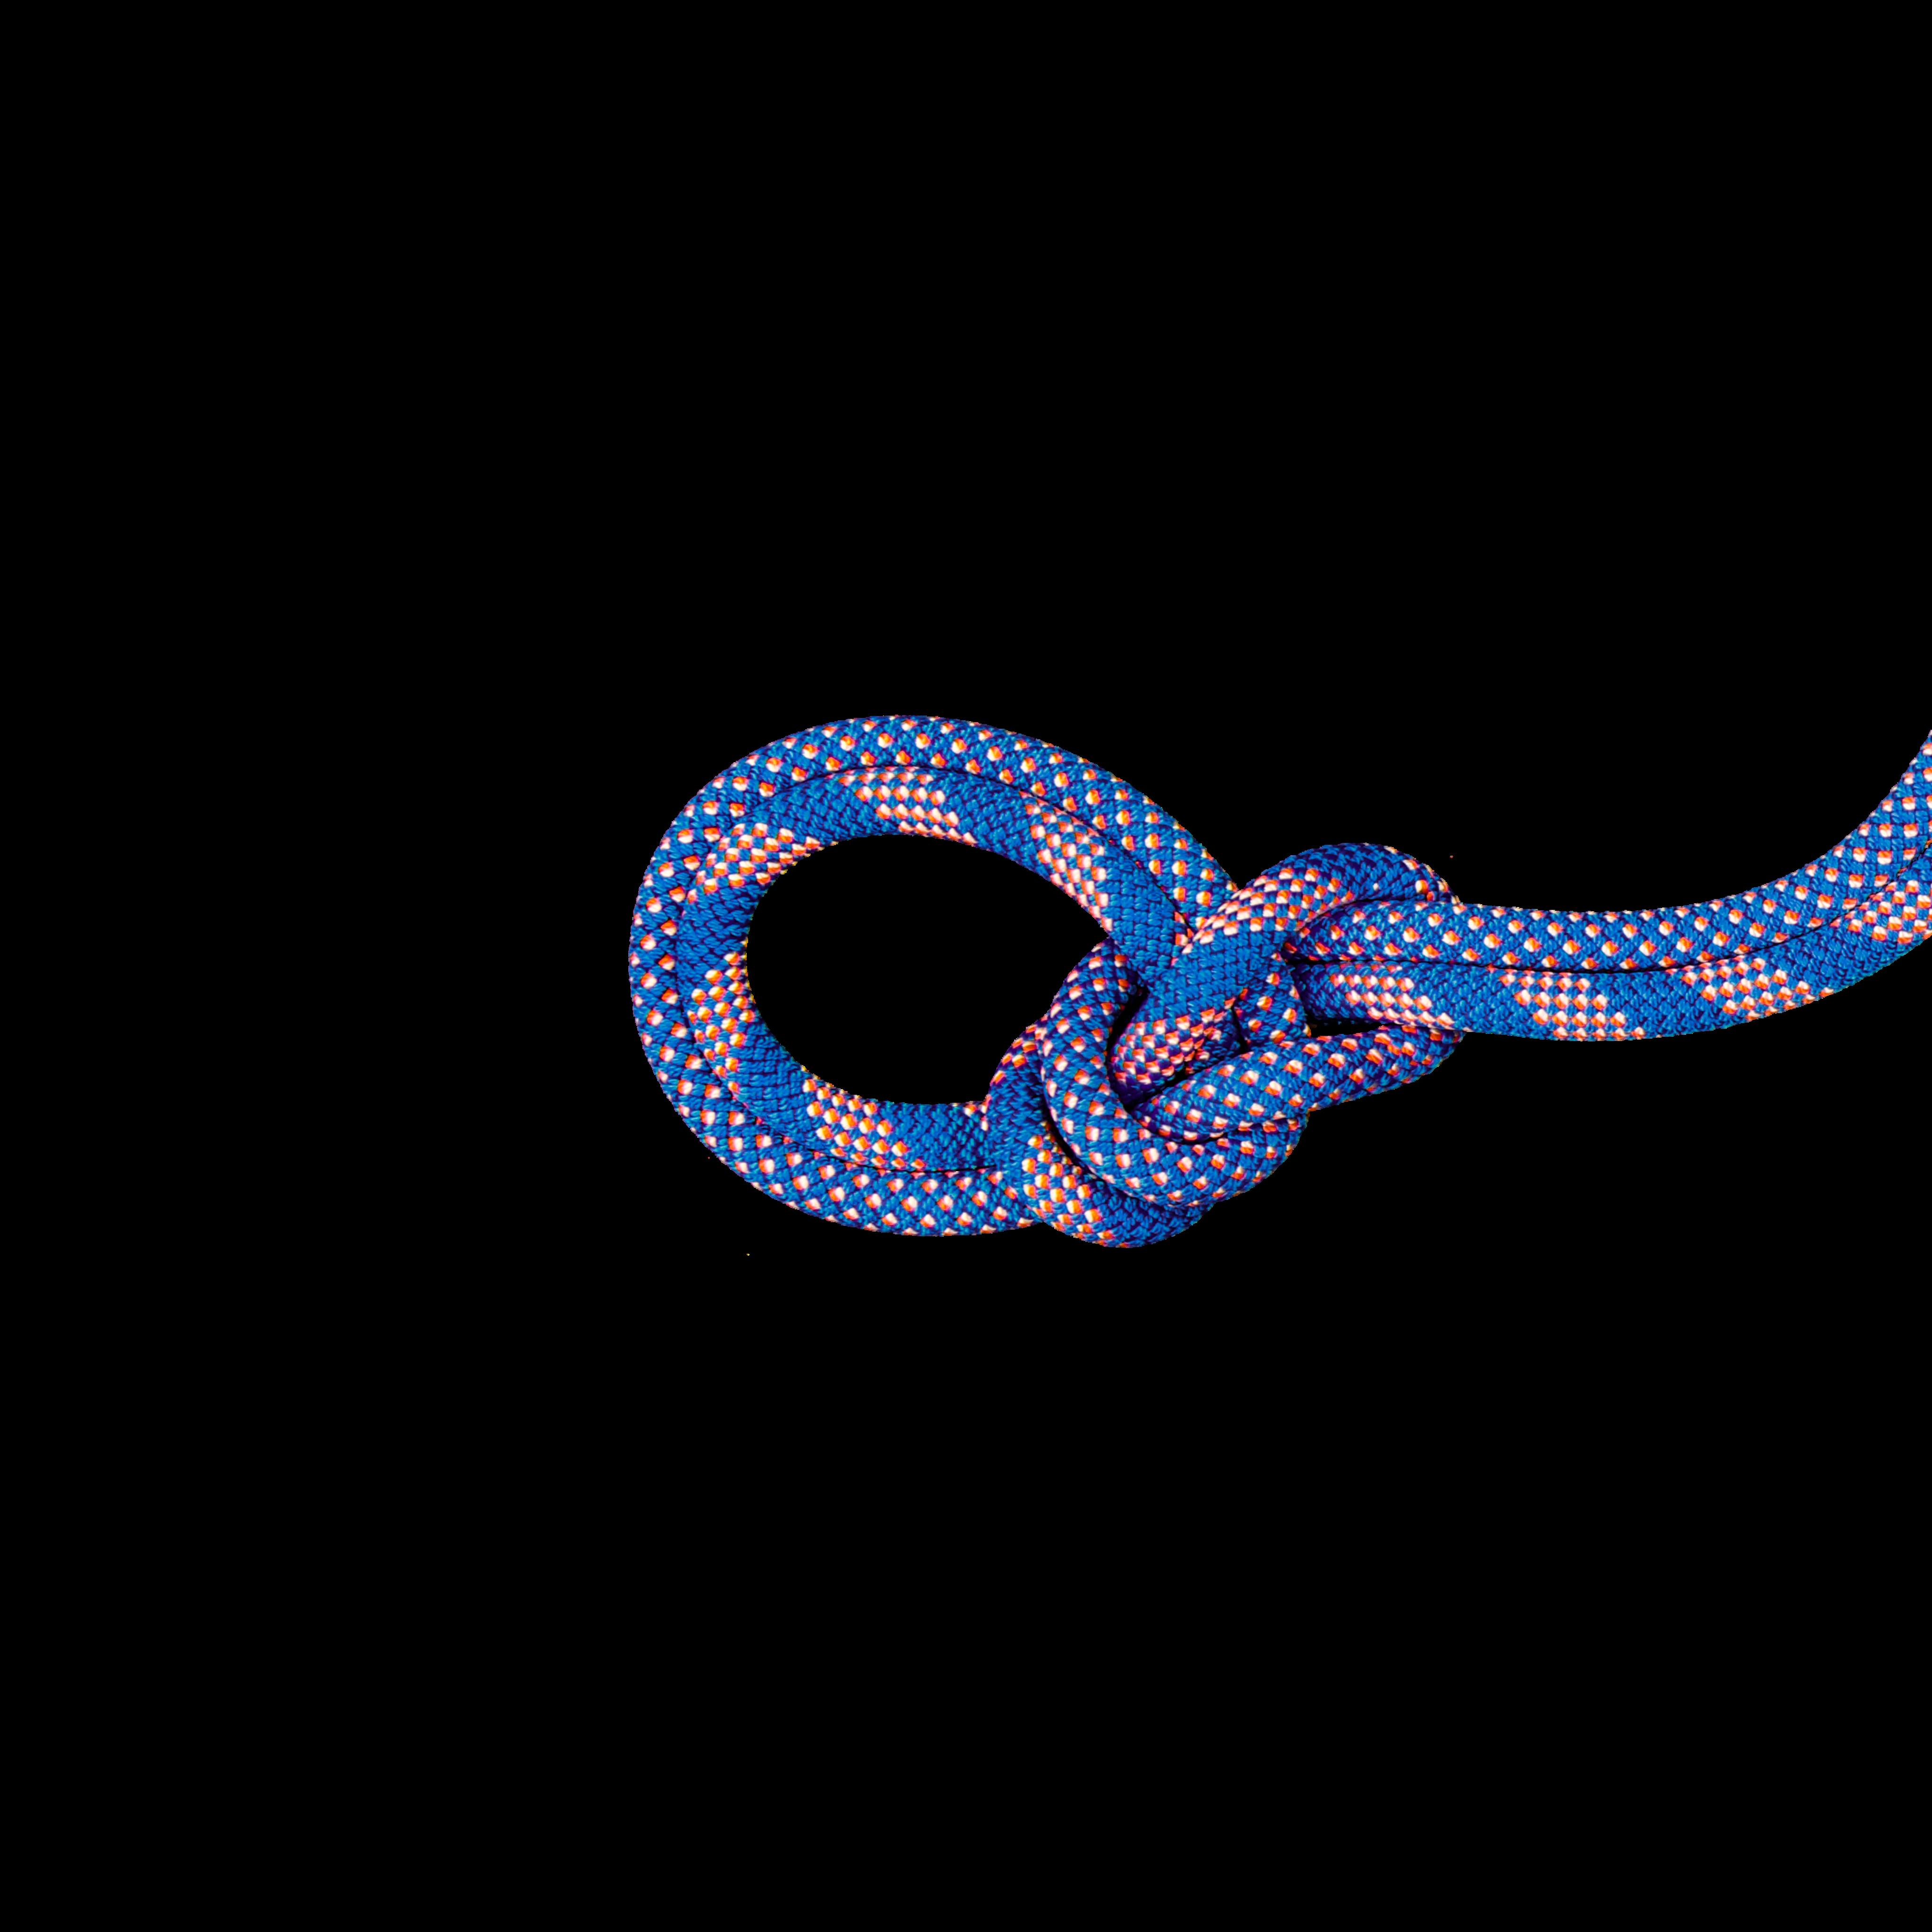 9.5 Crag Classic Rope - 60 m, Classic Duodess, carribean blue-white thumbnail